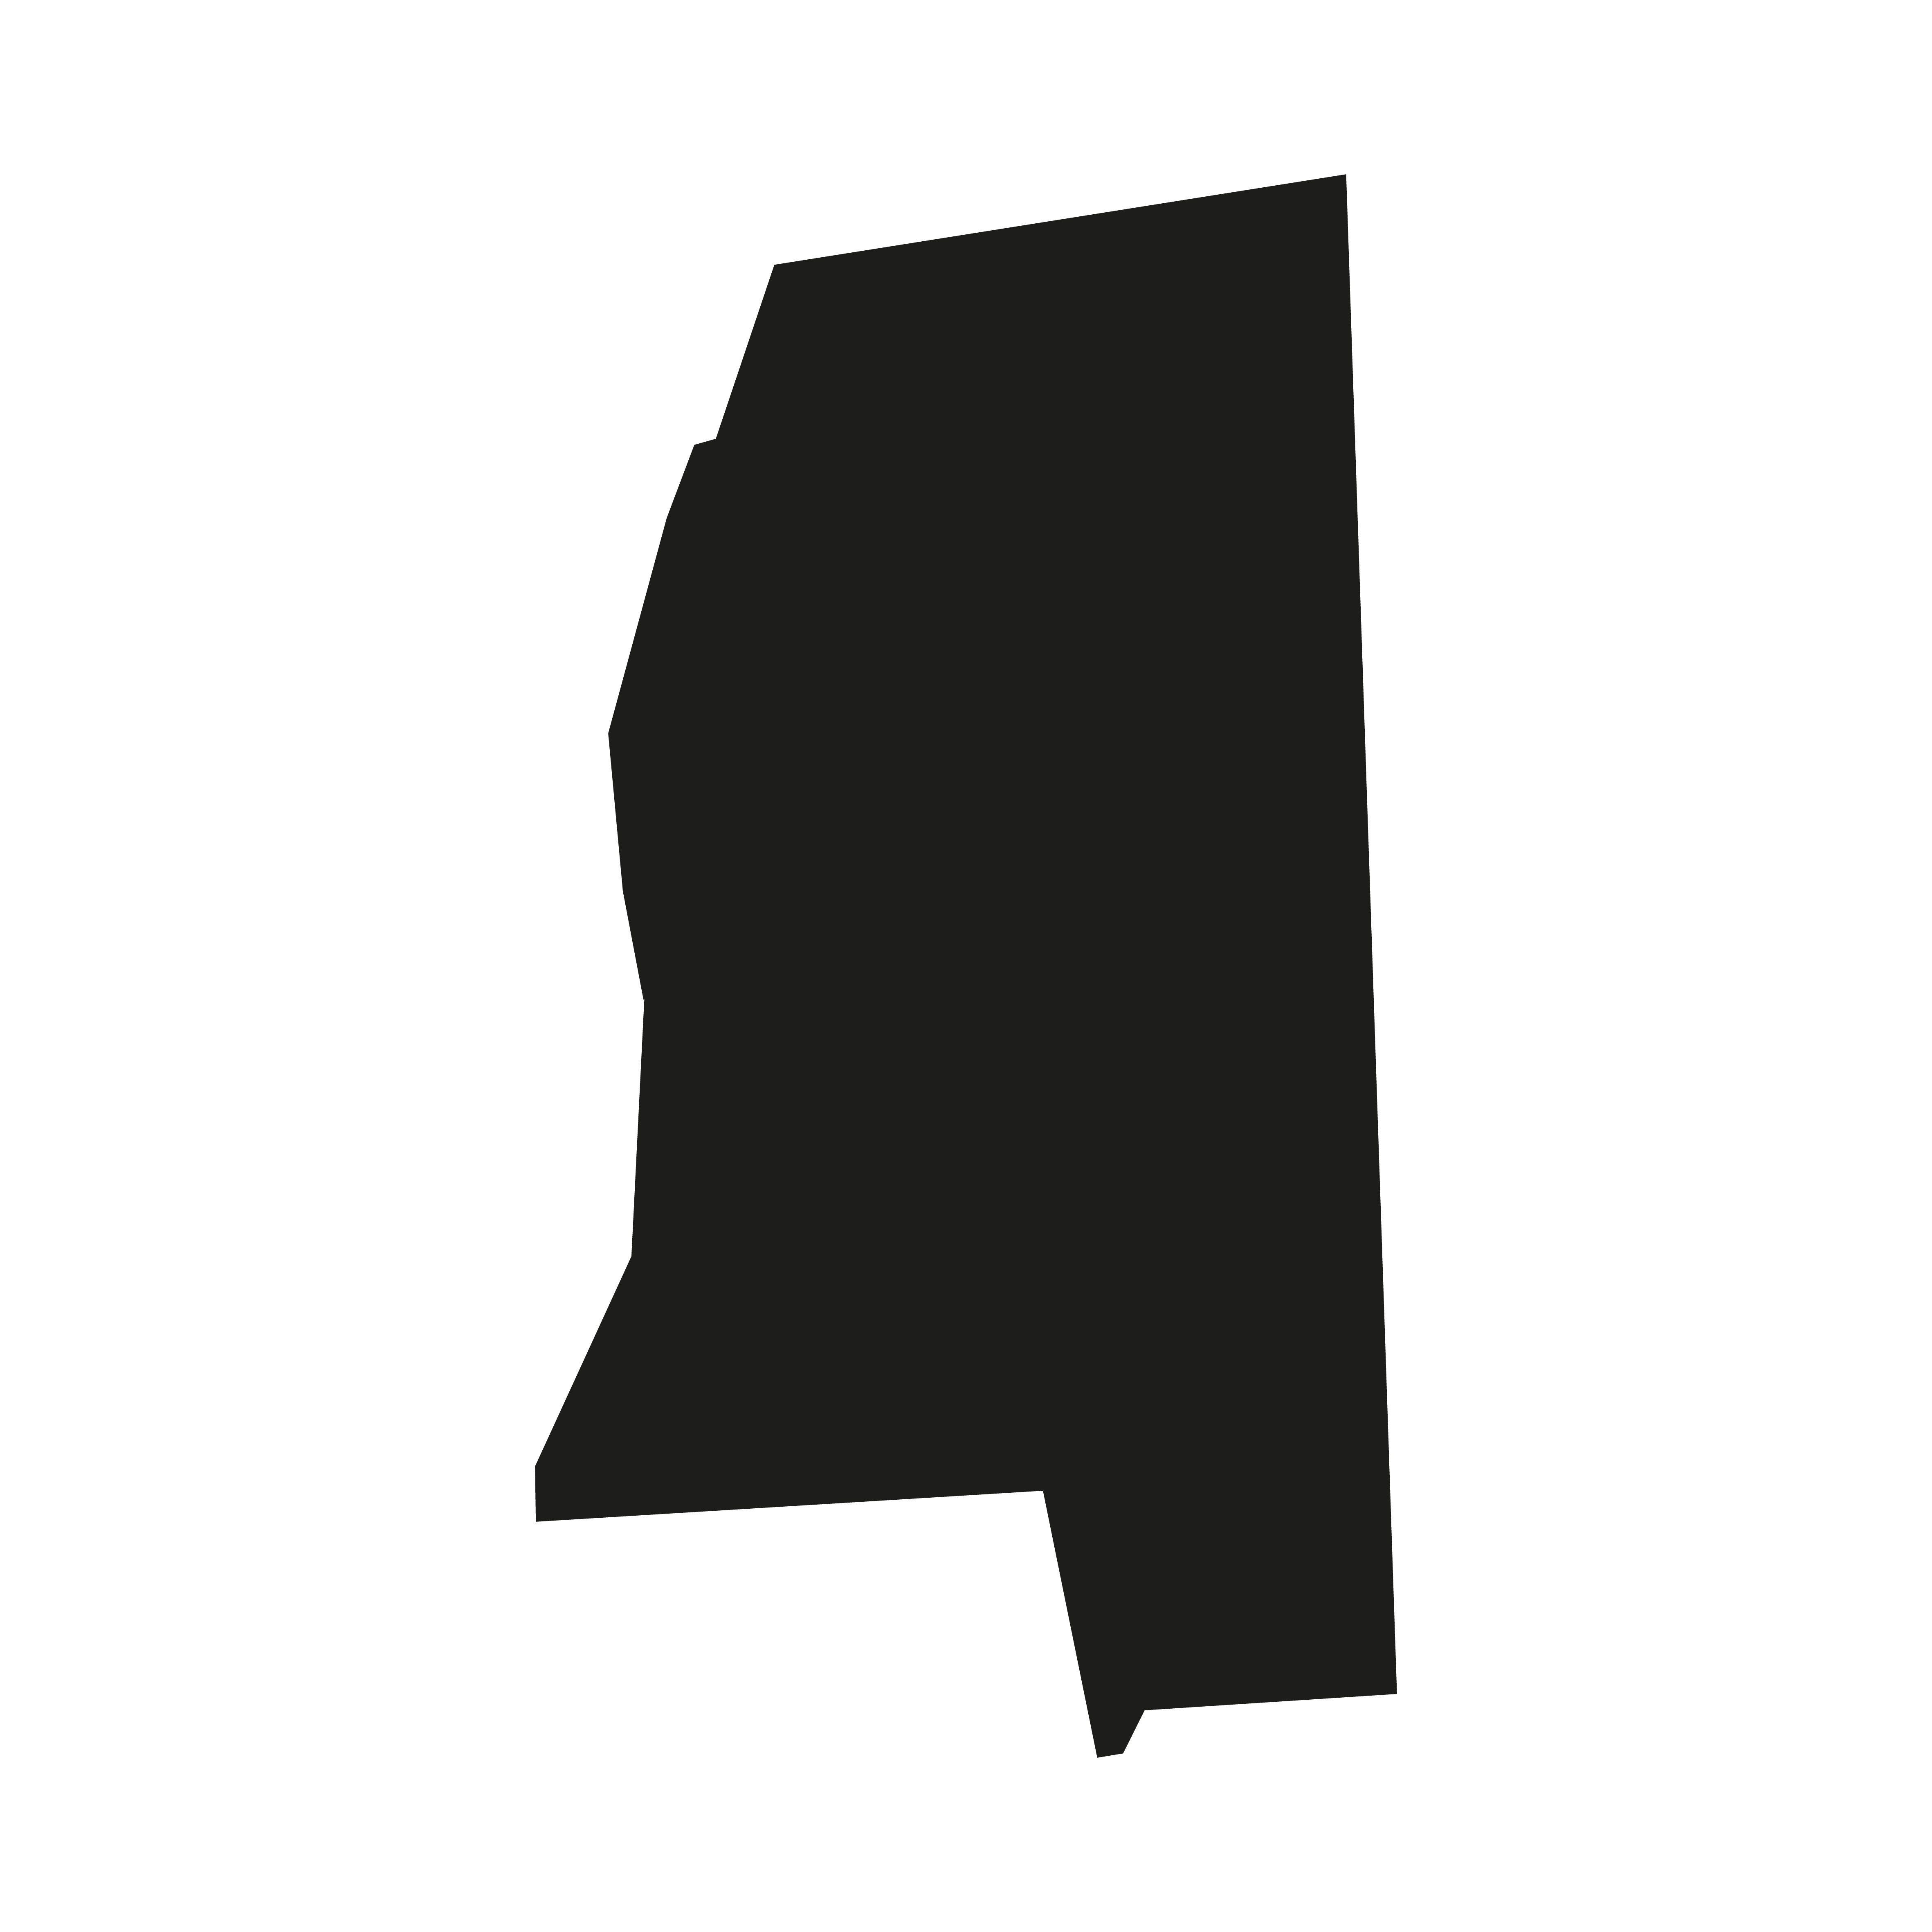 Mississippi, America, Modern, Vector, Usa, HQ Photo